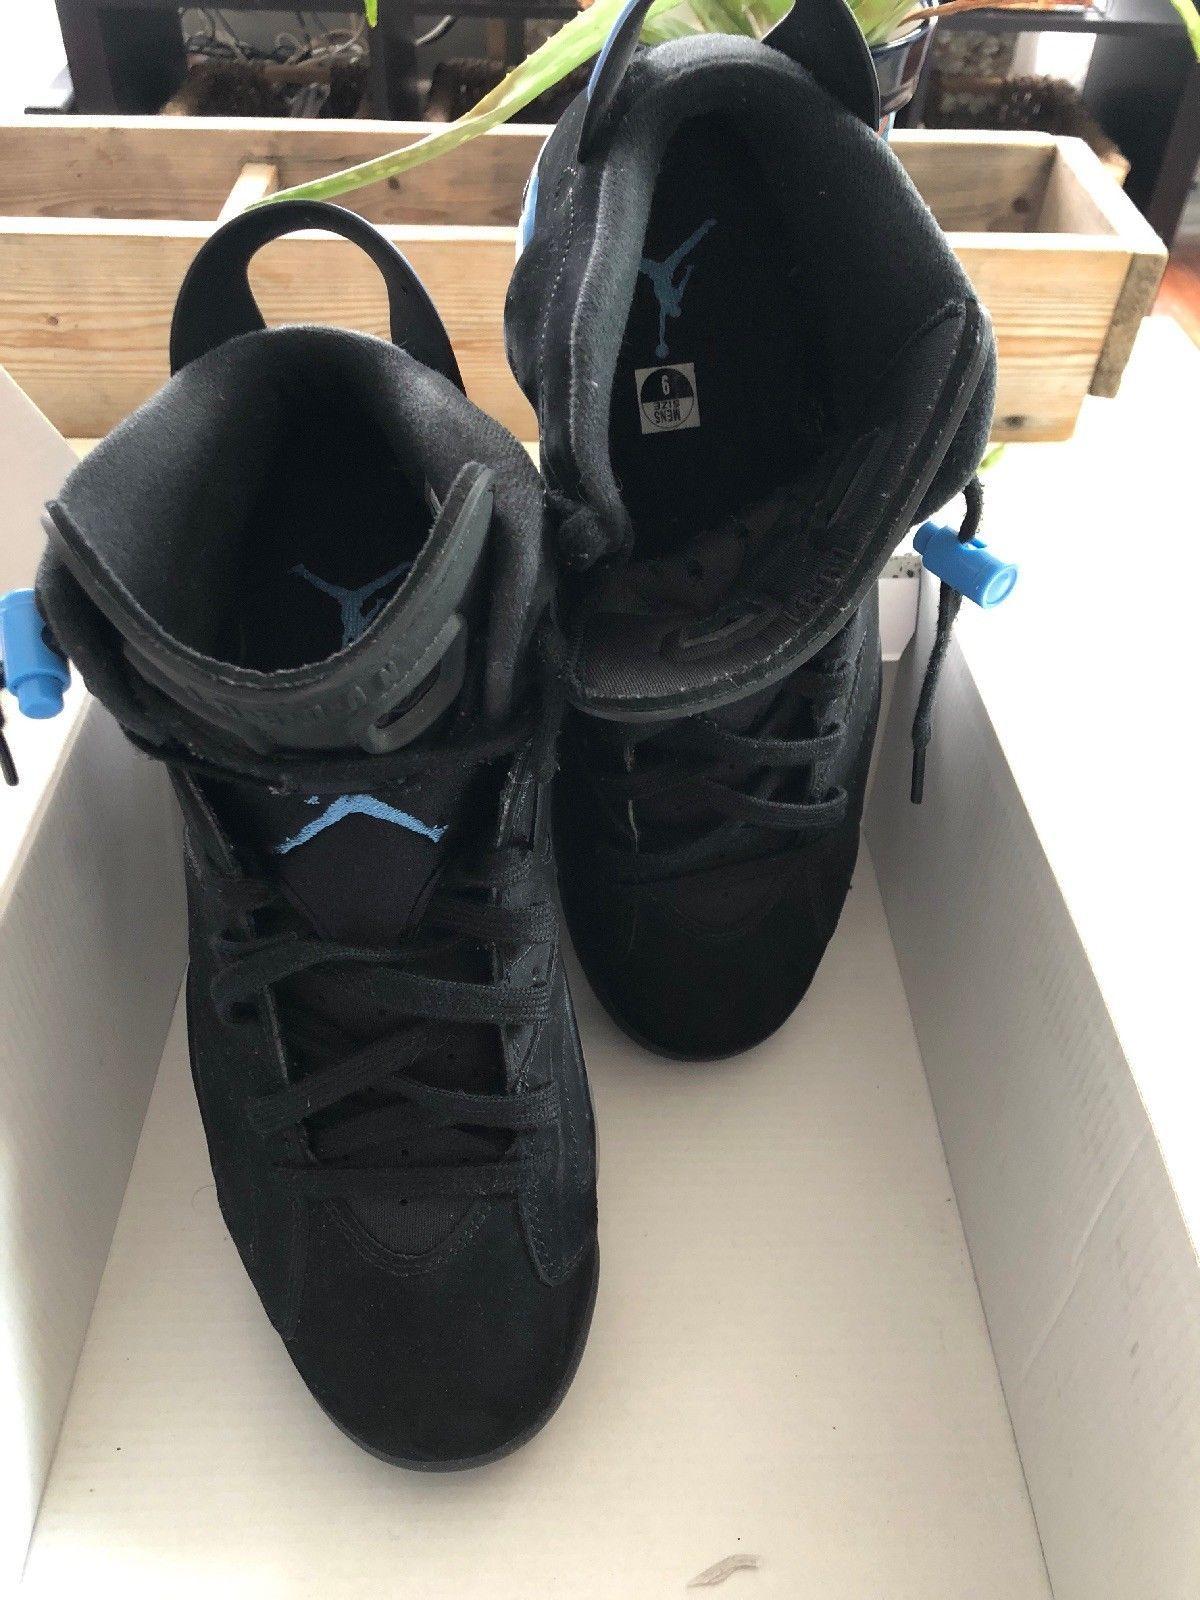 c6d6b8de380 Nike Air Jordan Retro 6 Vi UNC Black University Blue North Carolina  384664-006